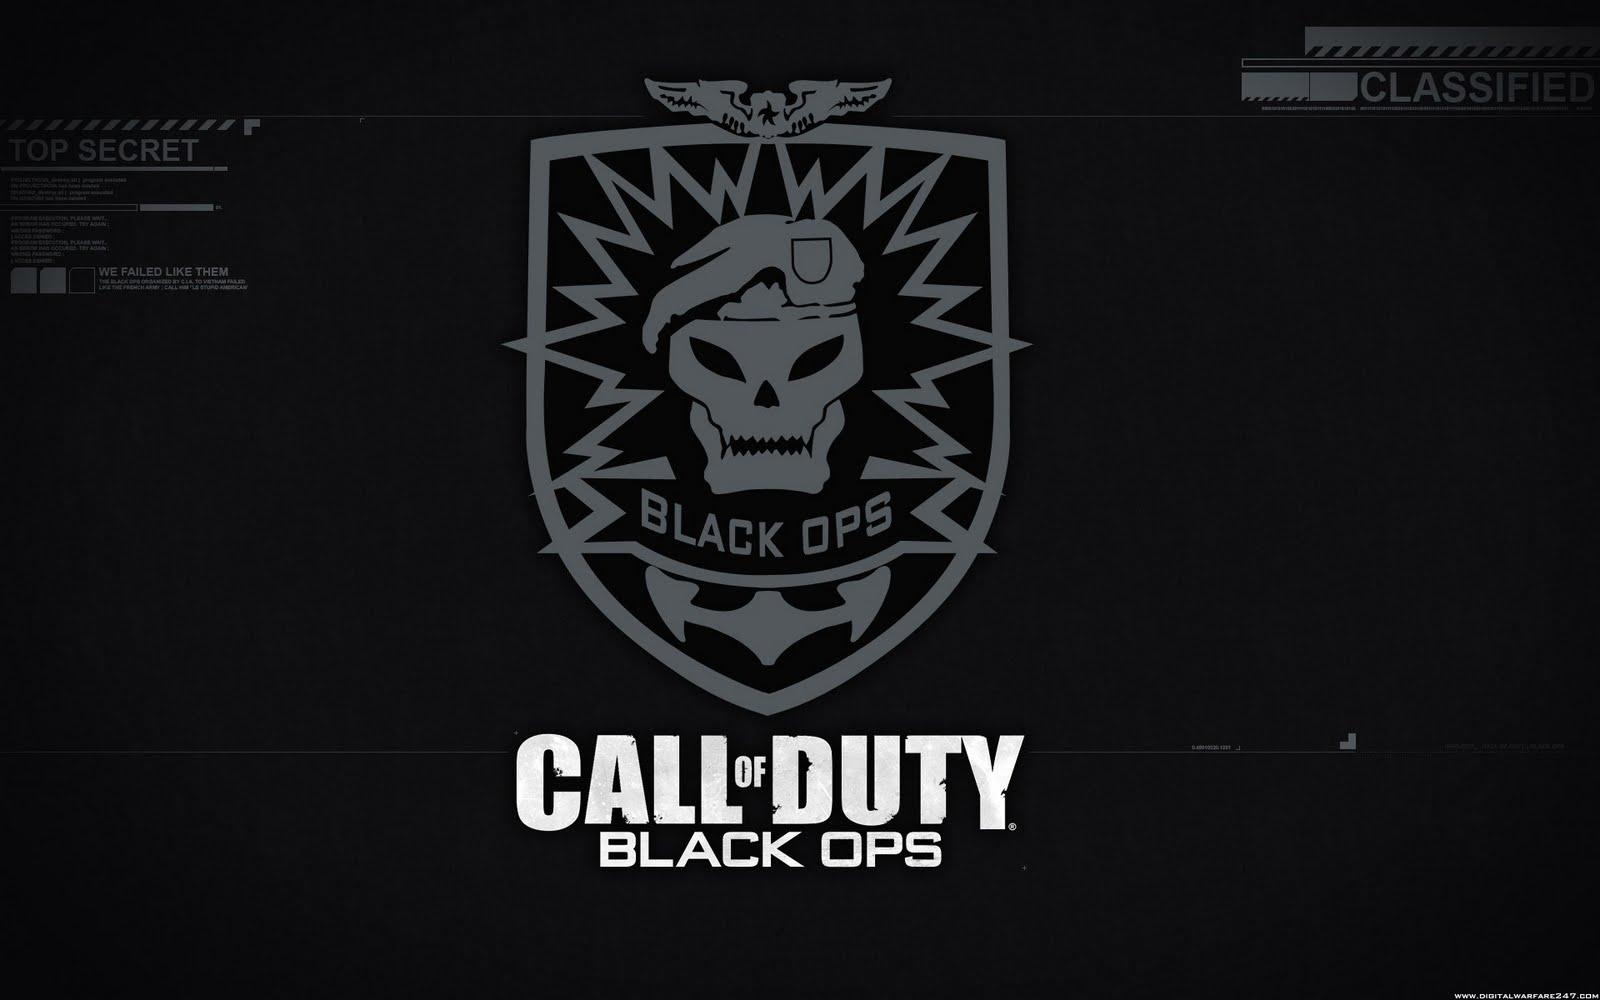 http://2.bp.blogspot.com/-jlZ_U4syTaw/Tiri0IZOH5I/AAAAAAAACWQ/58UZeAjuK5I/s1600/call_of_duty_black_ops_logo_3.jpg